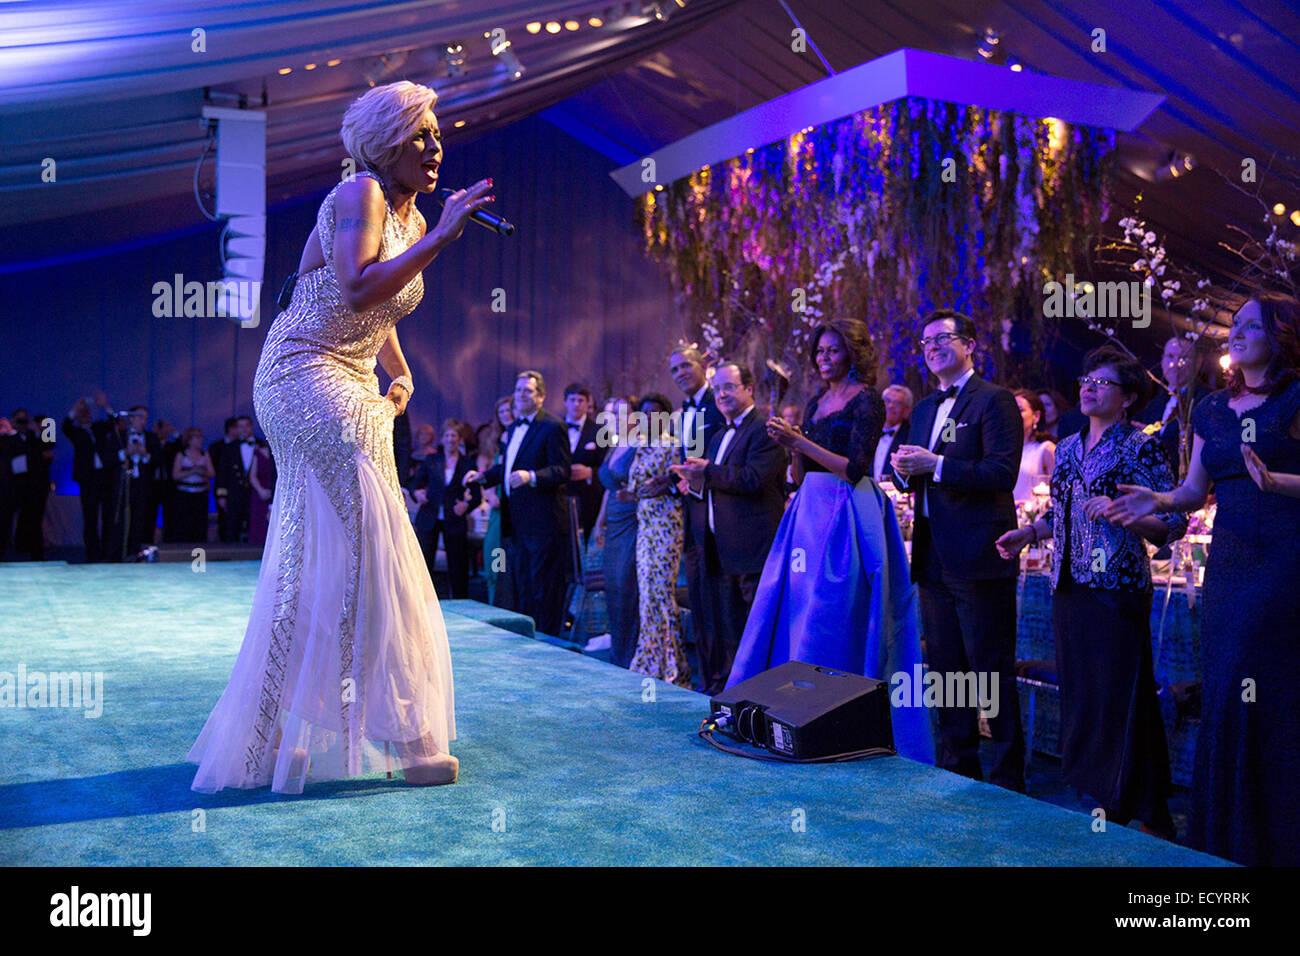 President Barack Obama, President François Hollande of France, First Lady Michelle Obama and guests watch performer - Stock Image